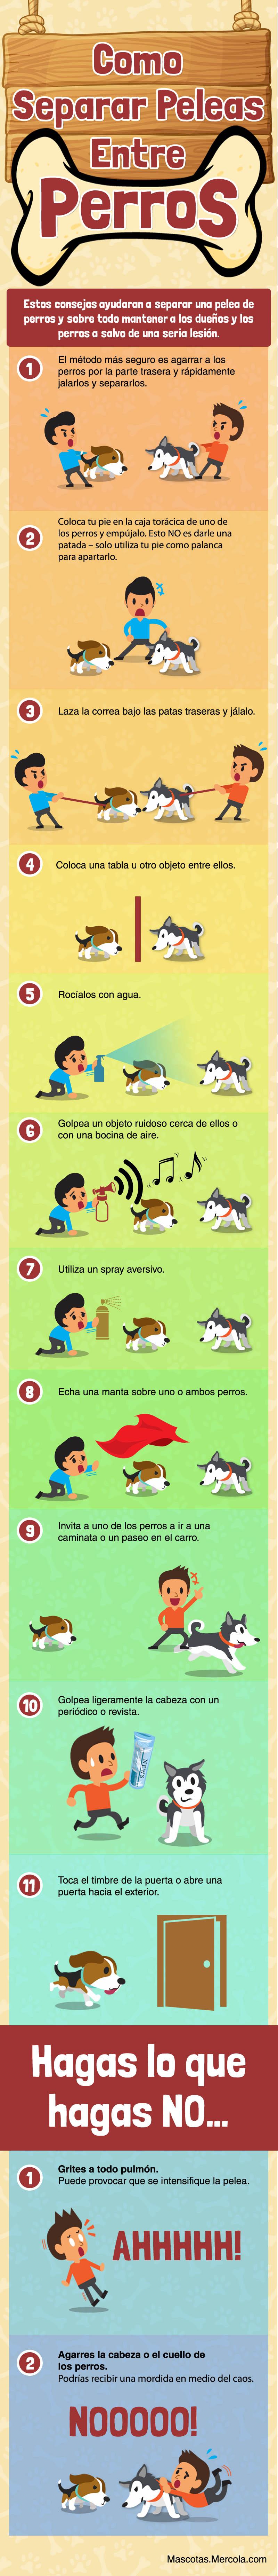 como separar peleas entre perros